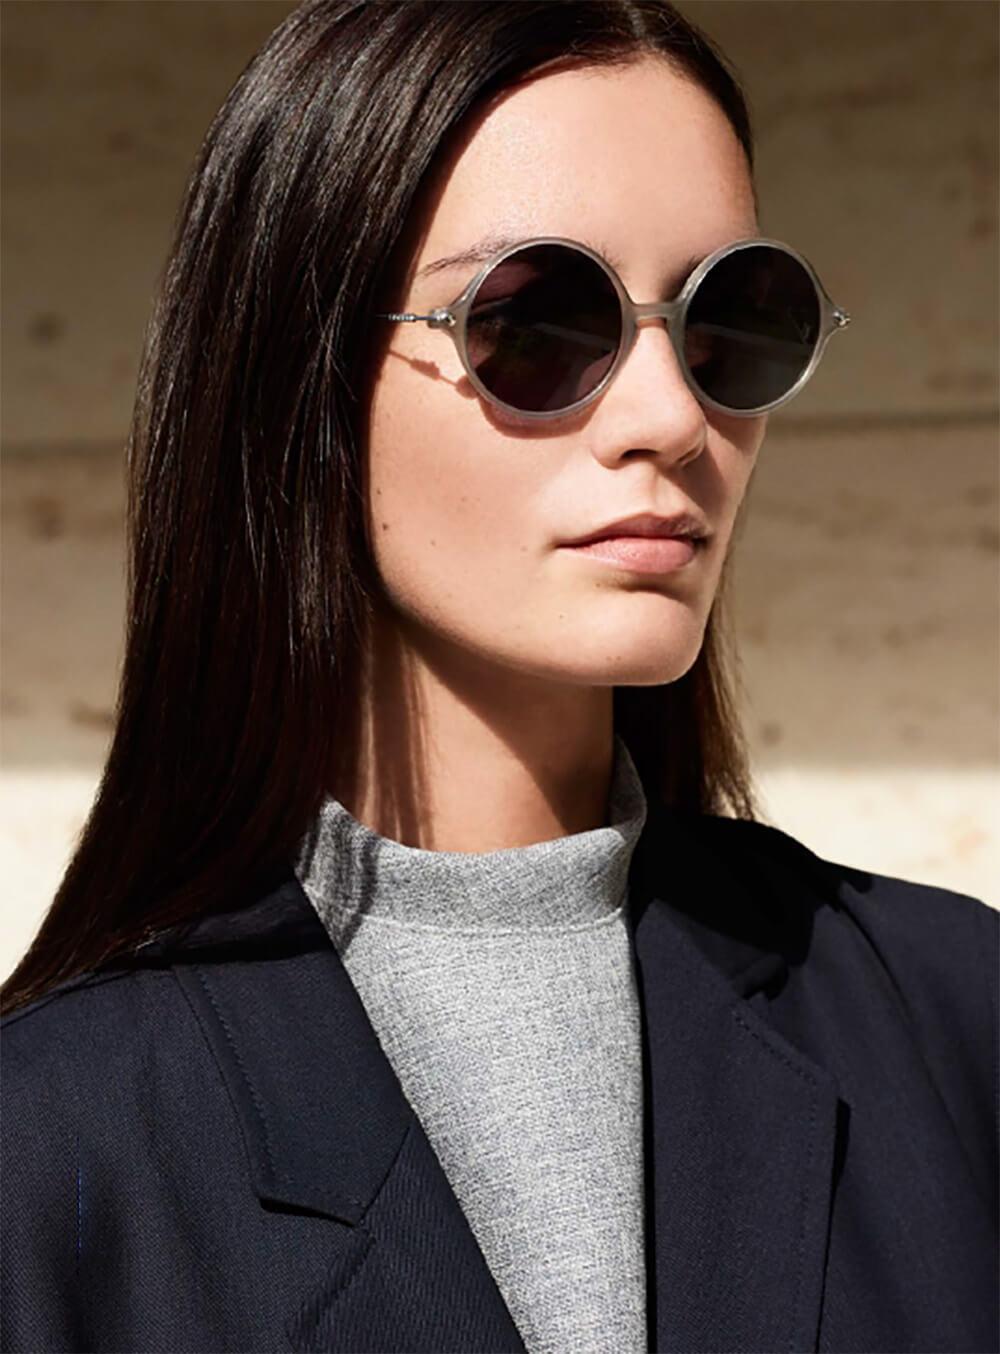 Joop-sunglasses